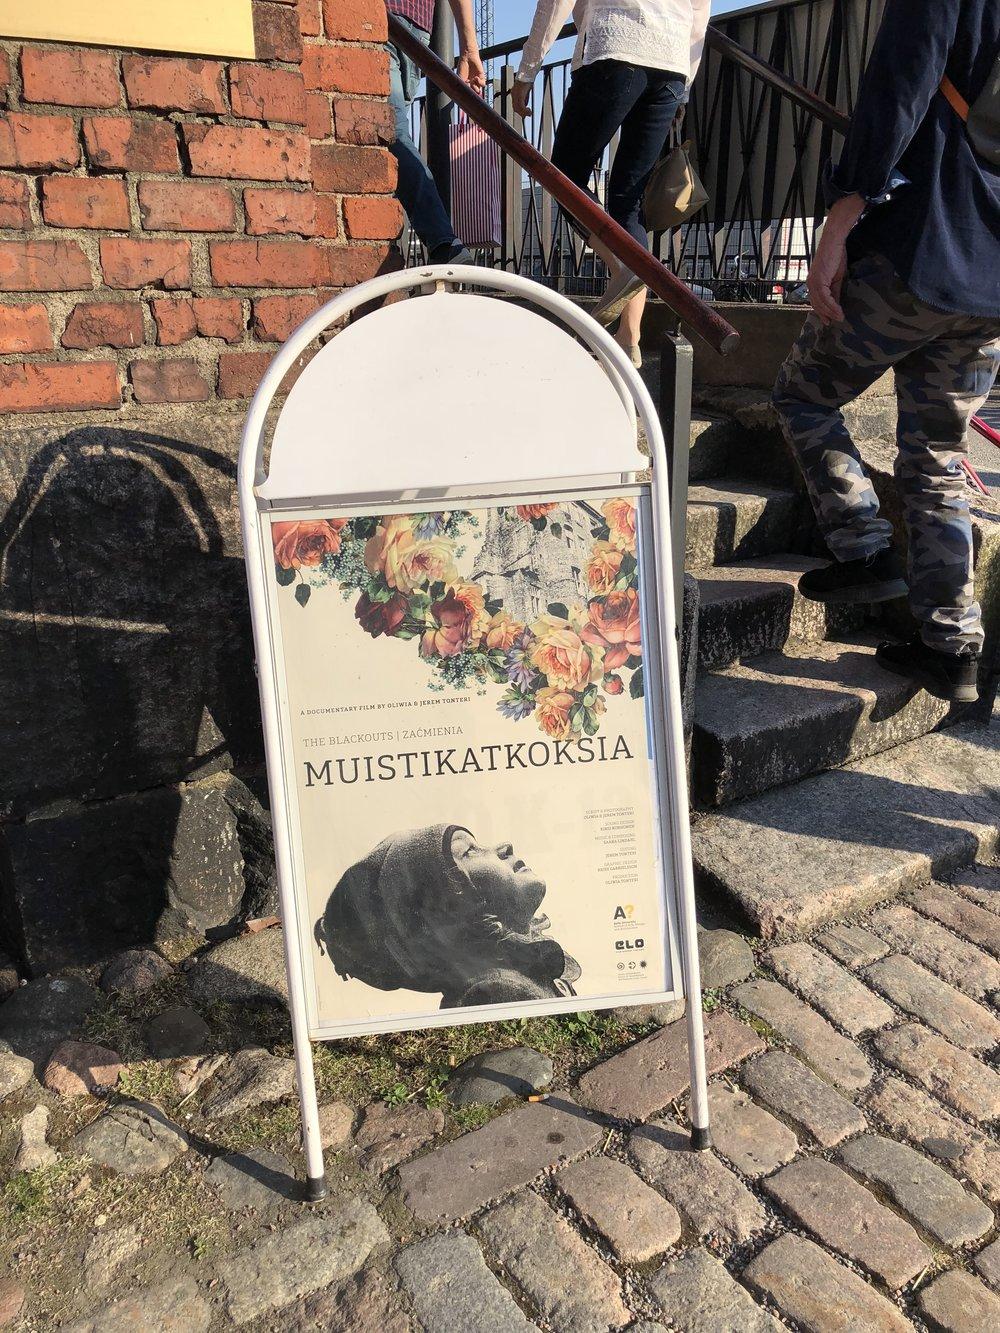 The Blackouts – Muistikatkoksia. Documentary film premiere in May 2018 at Kino K13 in Helsinki.